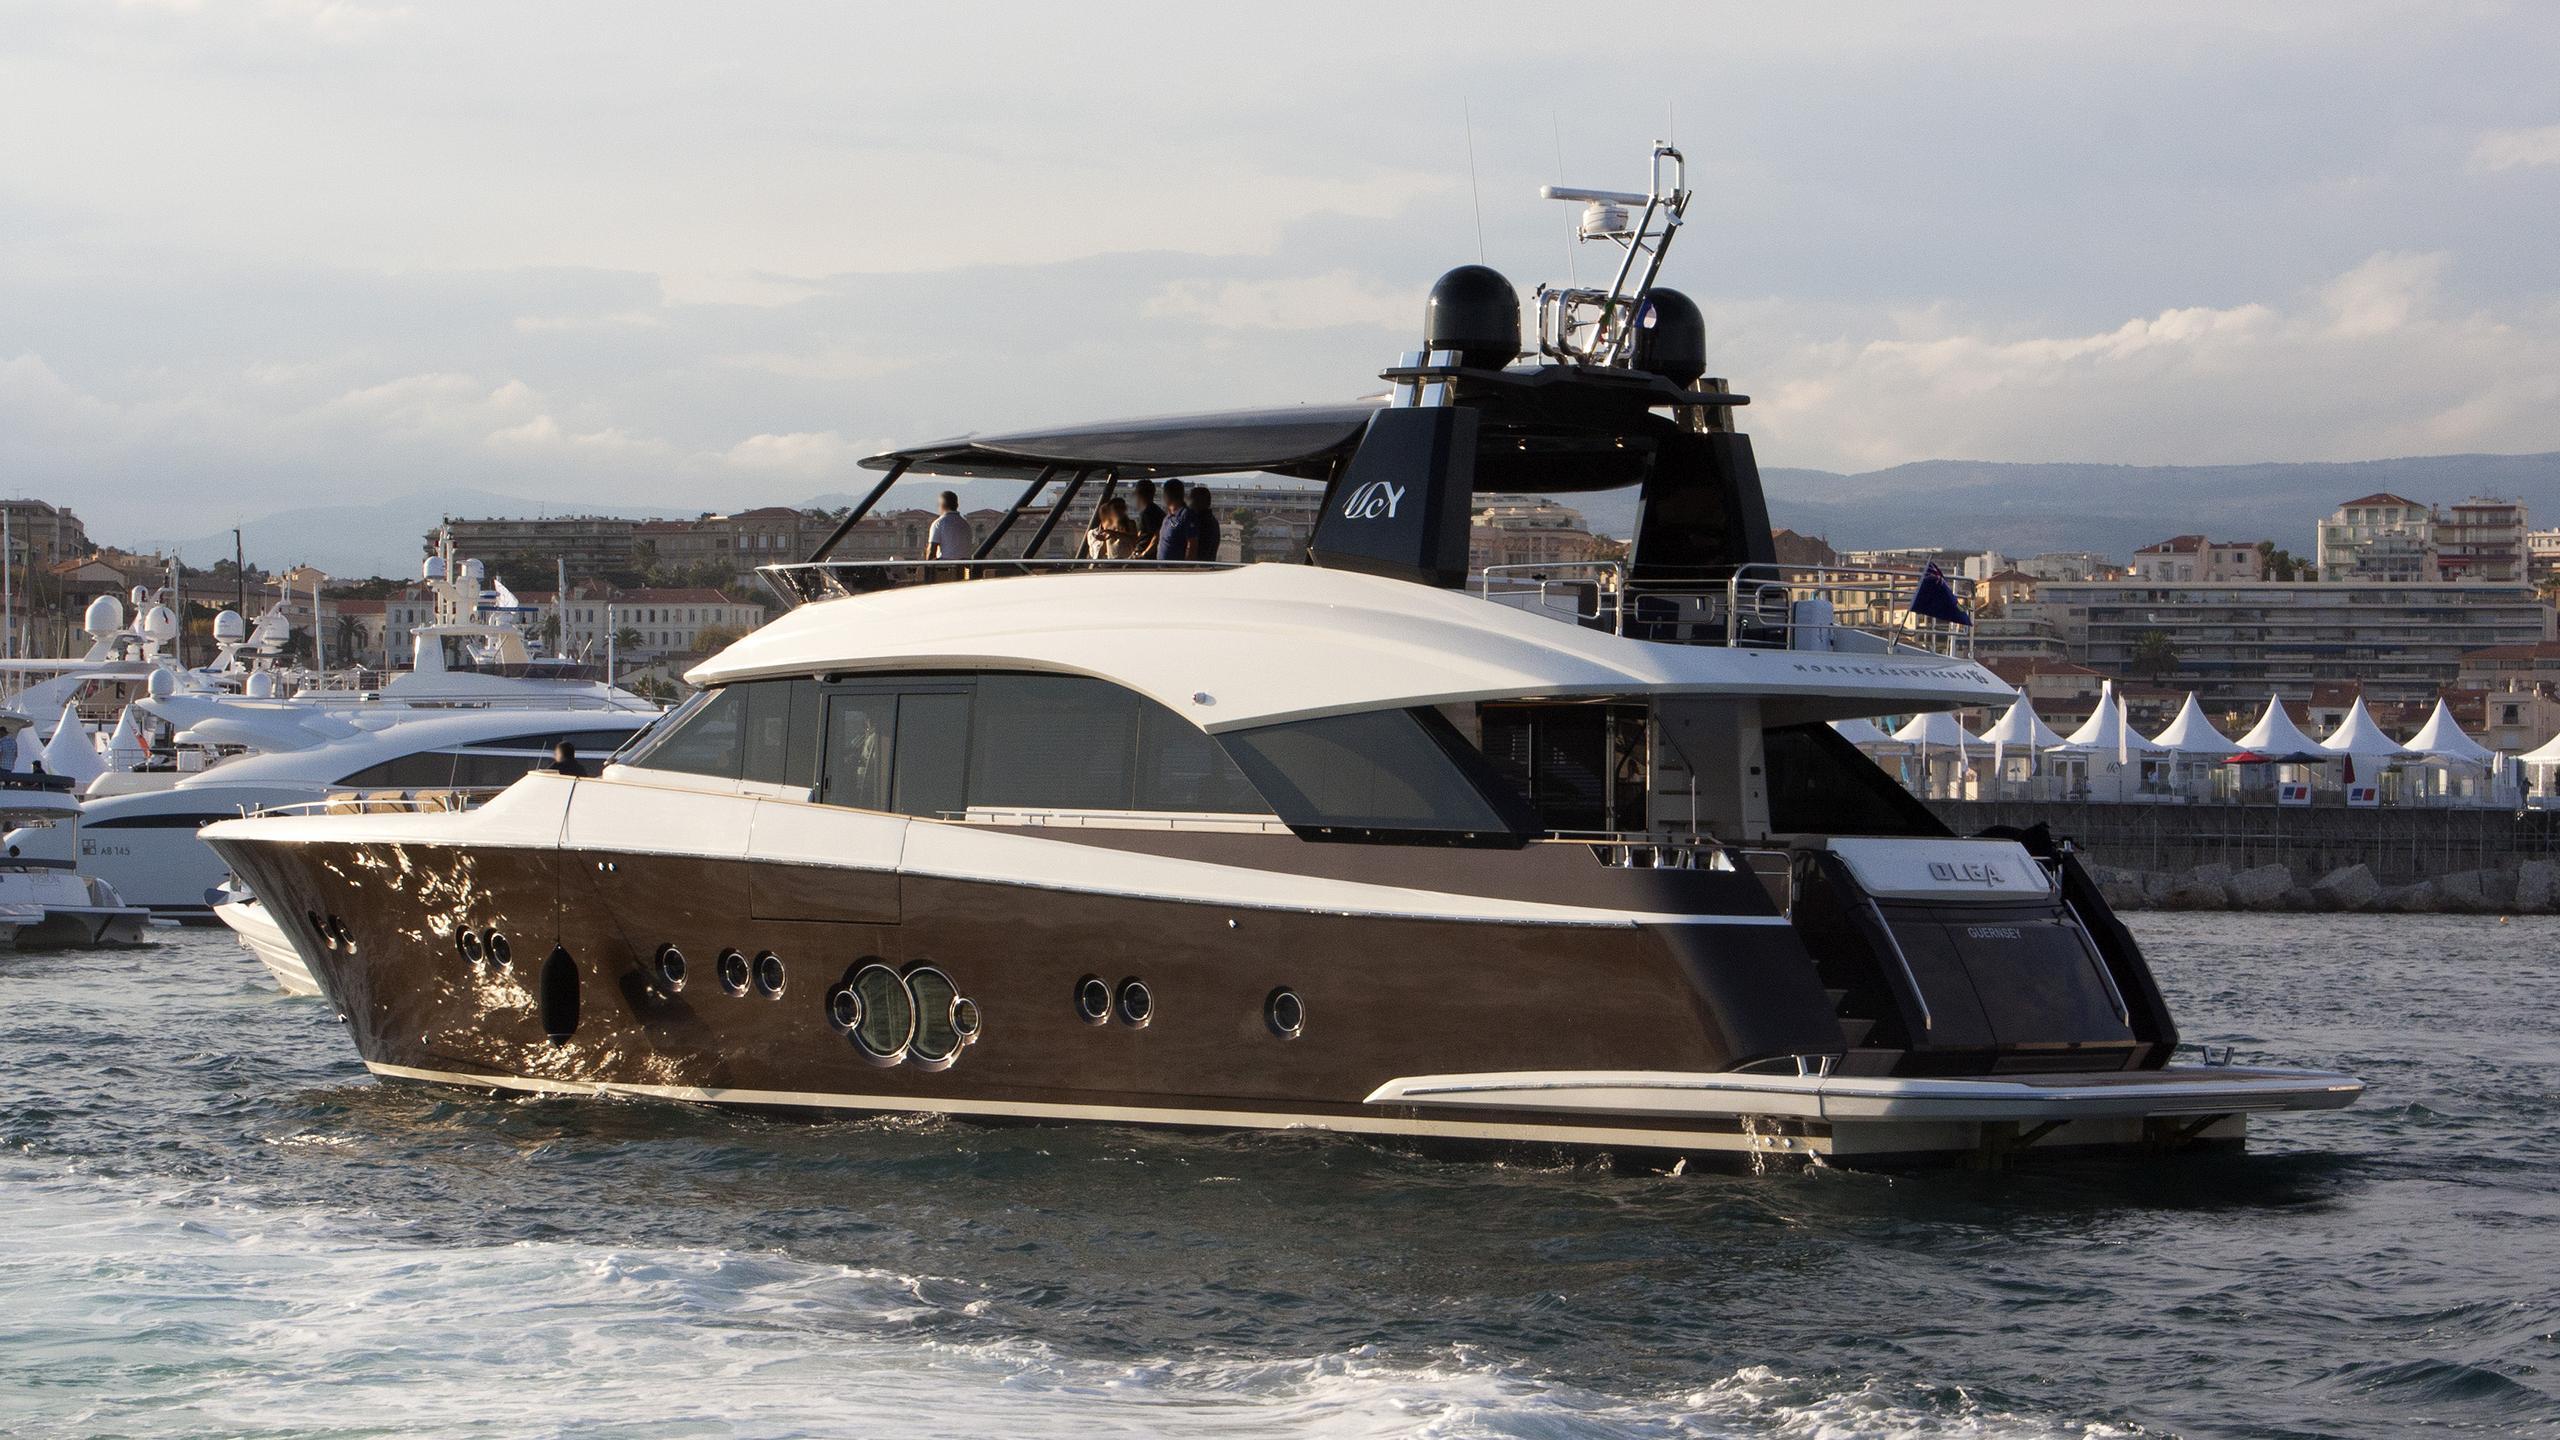 olga-motor-yacht-monte-carlo-yachts-mcy-86-2015-26m-profile